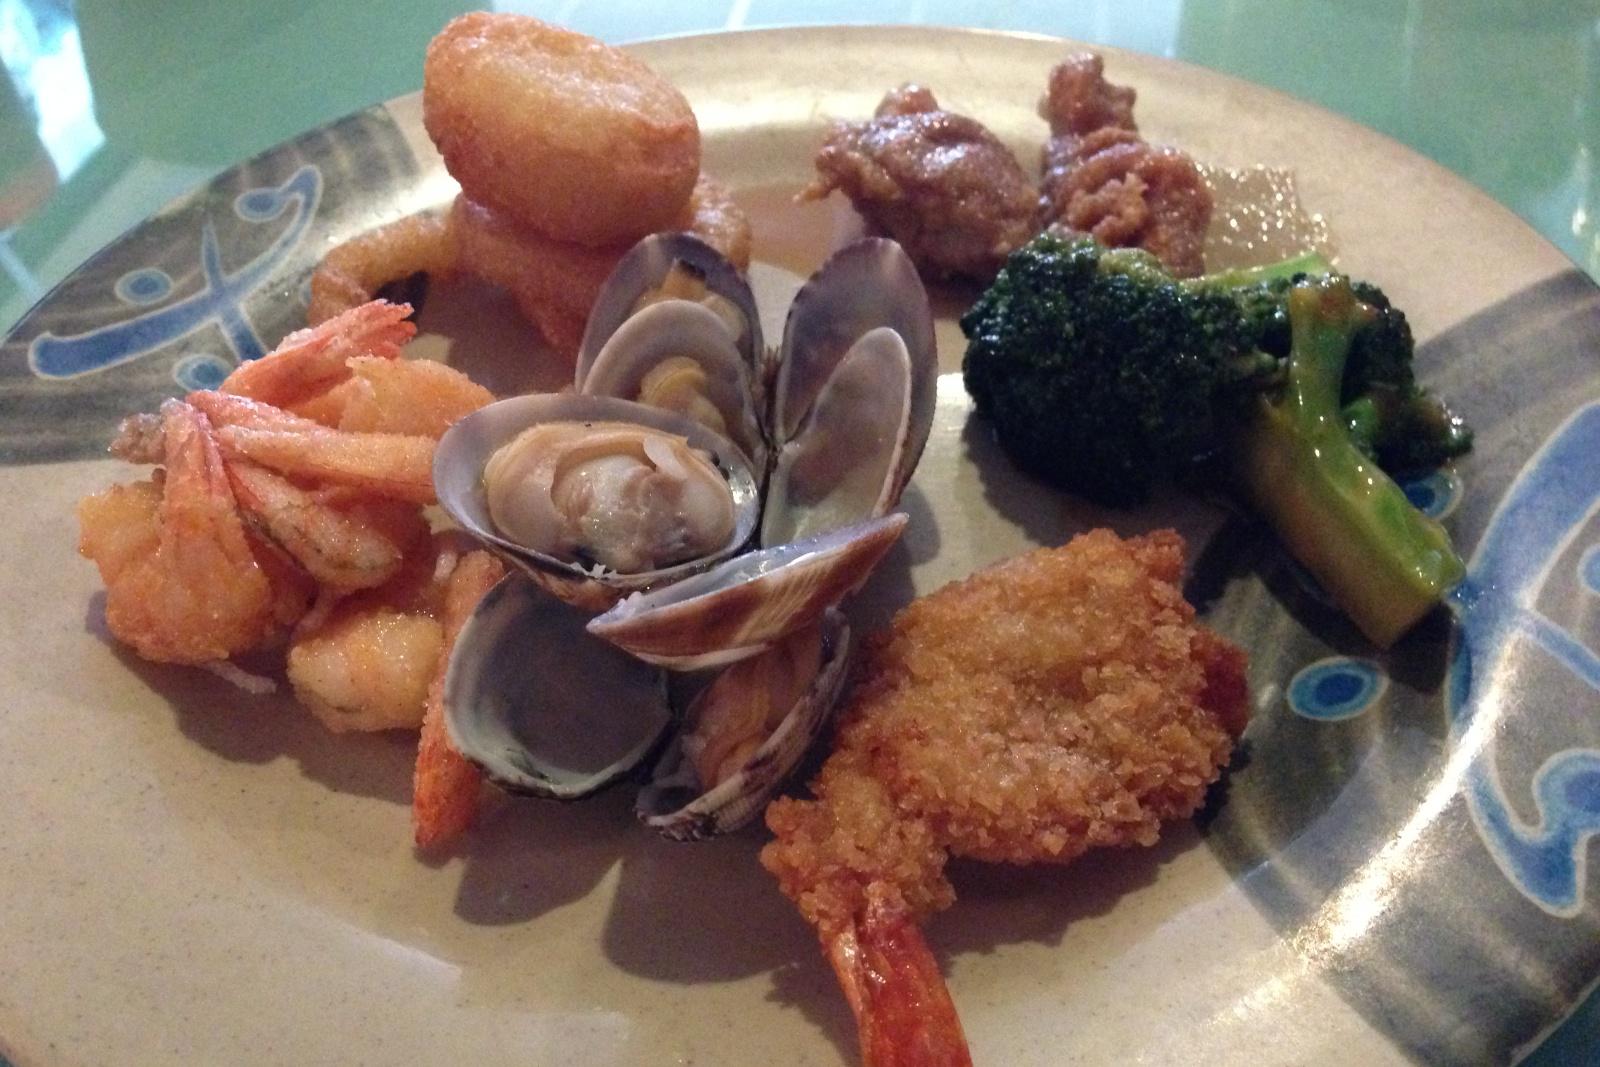 http://blog.rickk.com/food/2014/03/16/ate.2014.03.16.d2.jpg